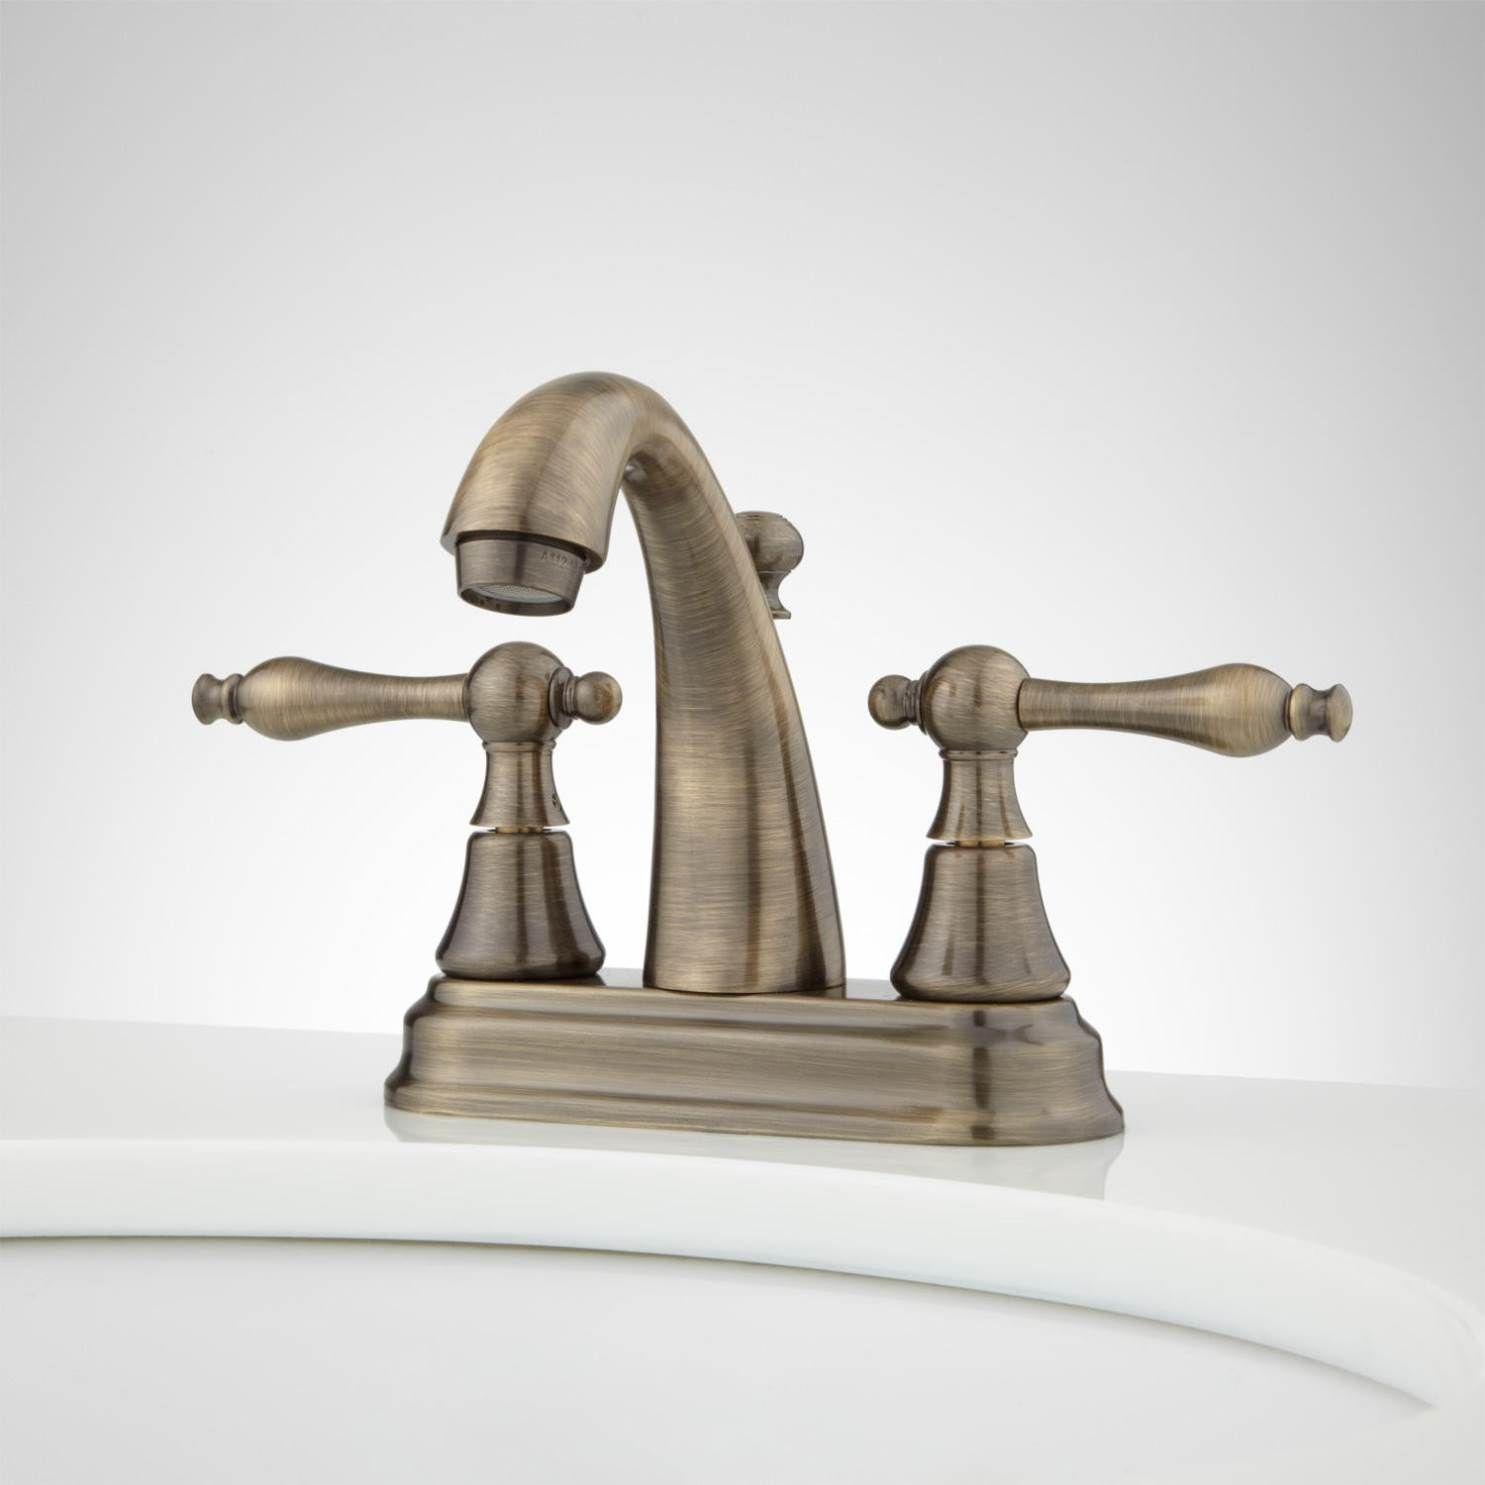 Antique Brass Faucets Bathroom Antique Brass Faucets Bathroom Easy